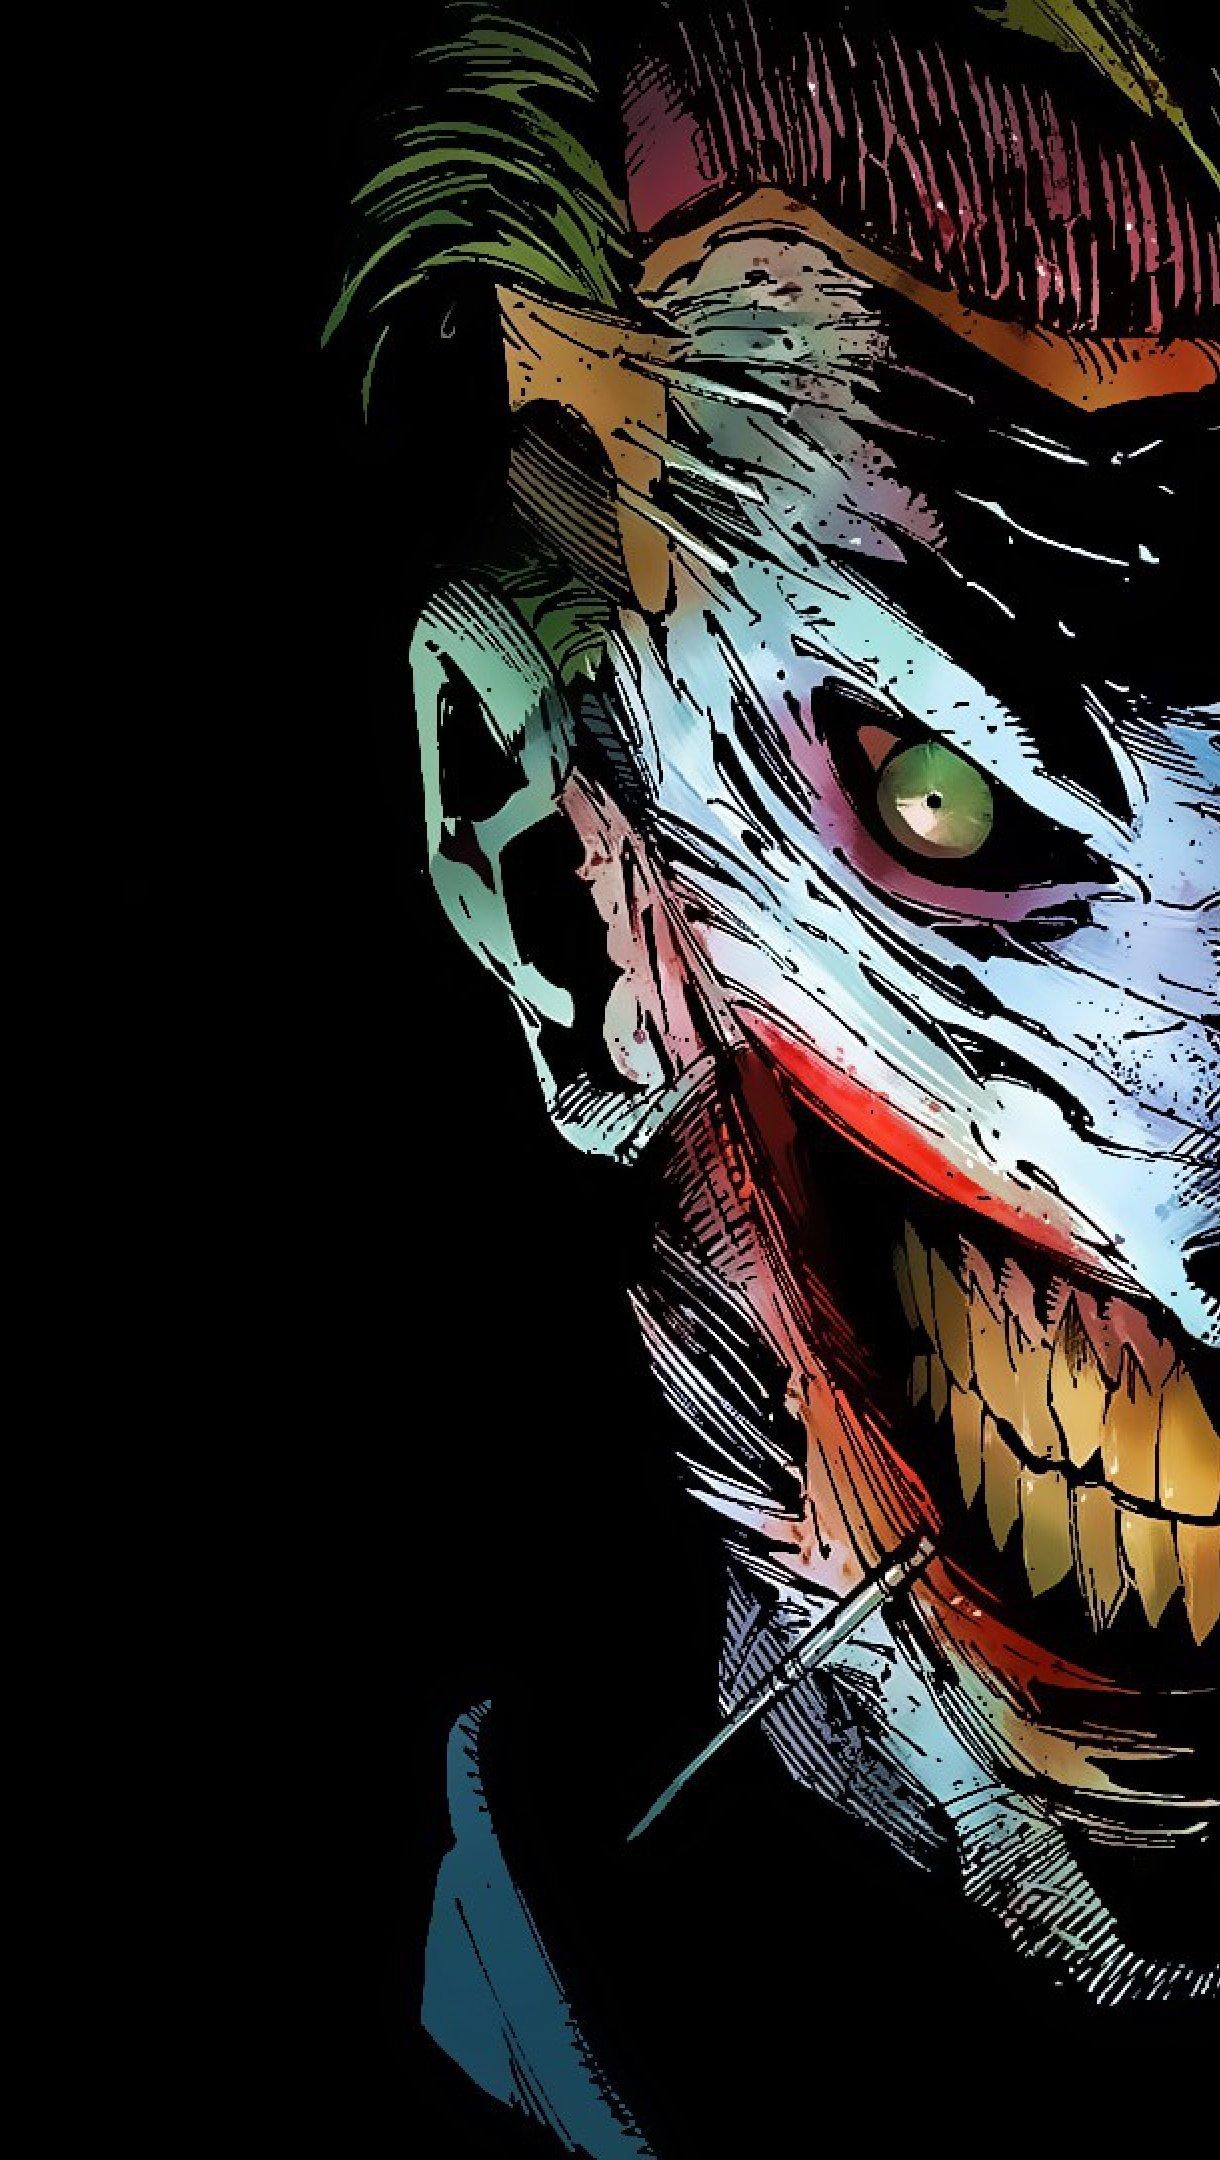 Wallpaper The Jokers Smile Vertical